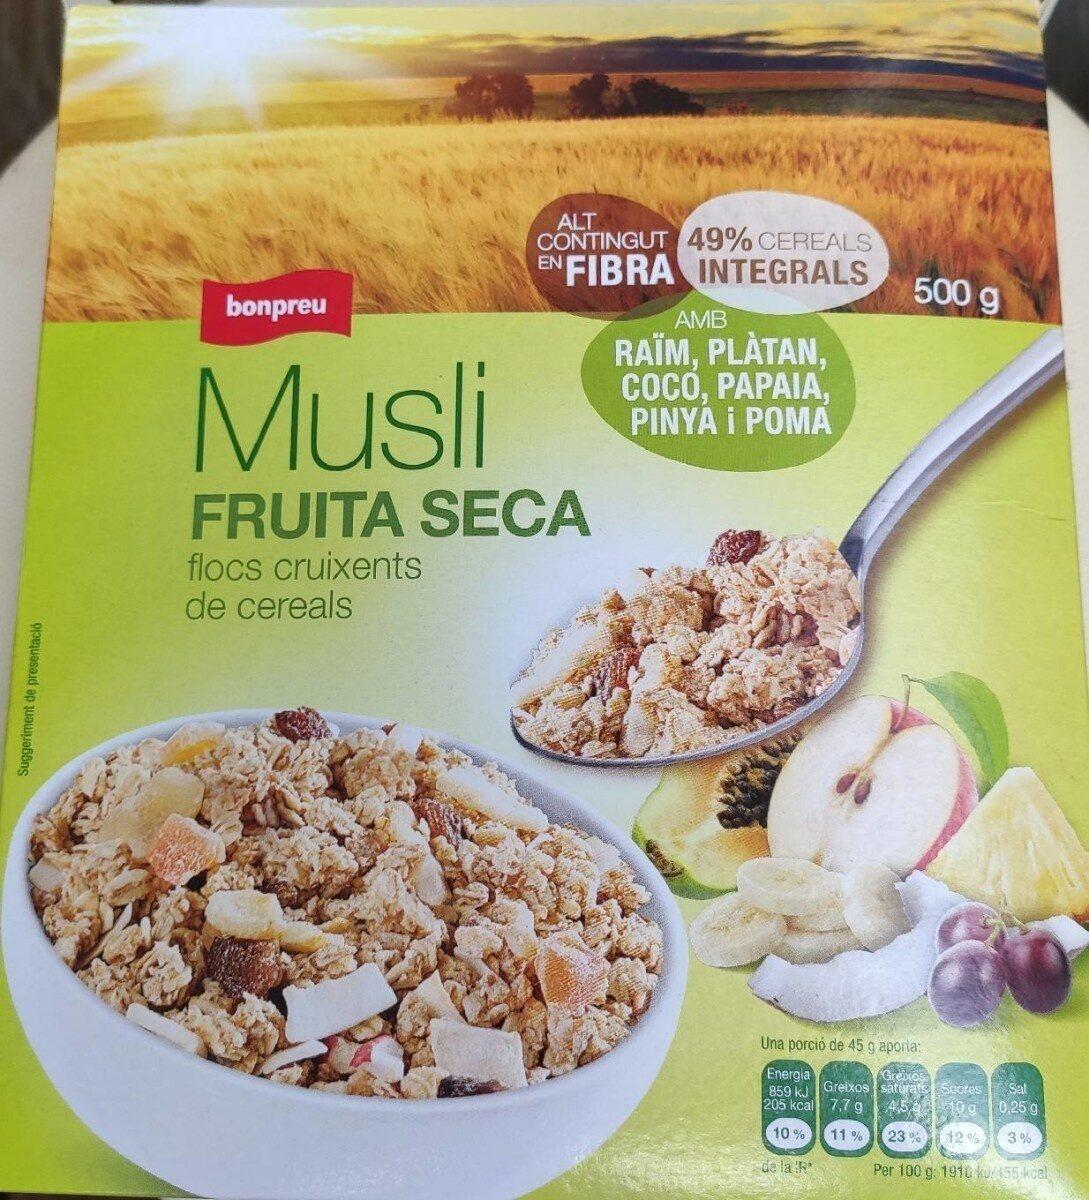 Musli fruita seca - Producte - ca